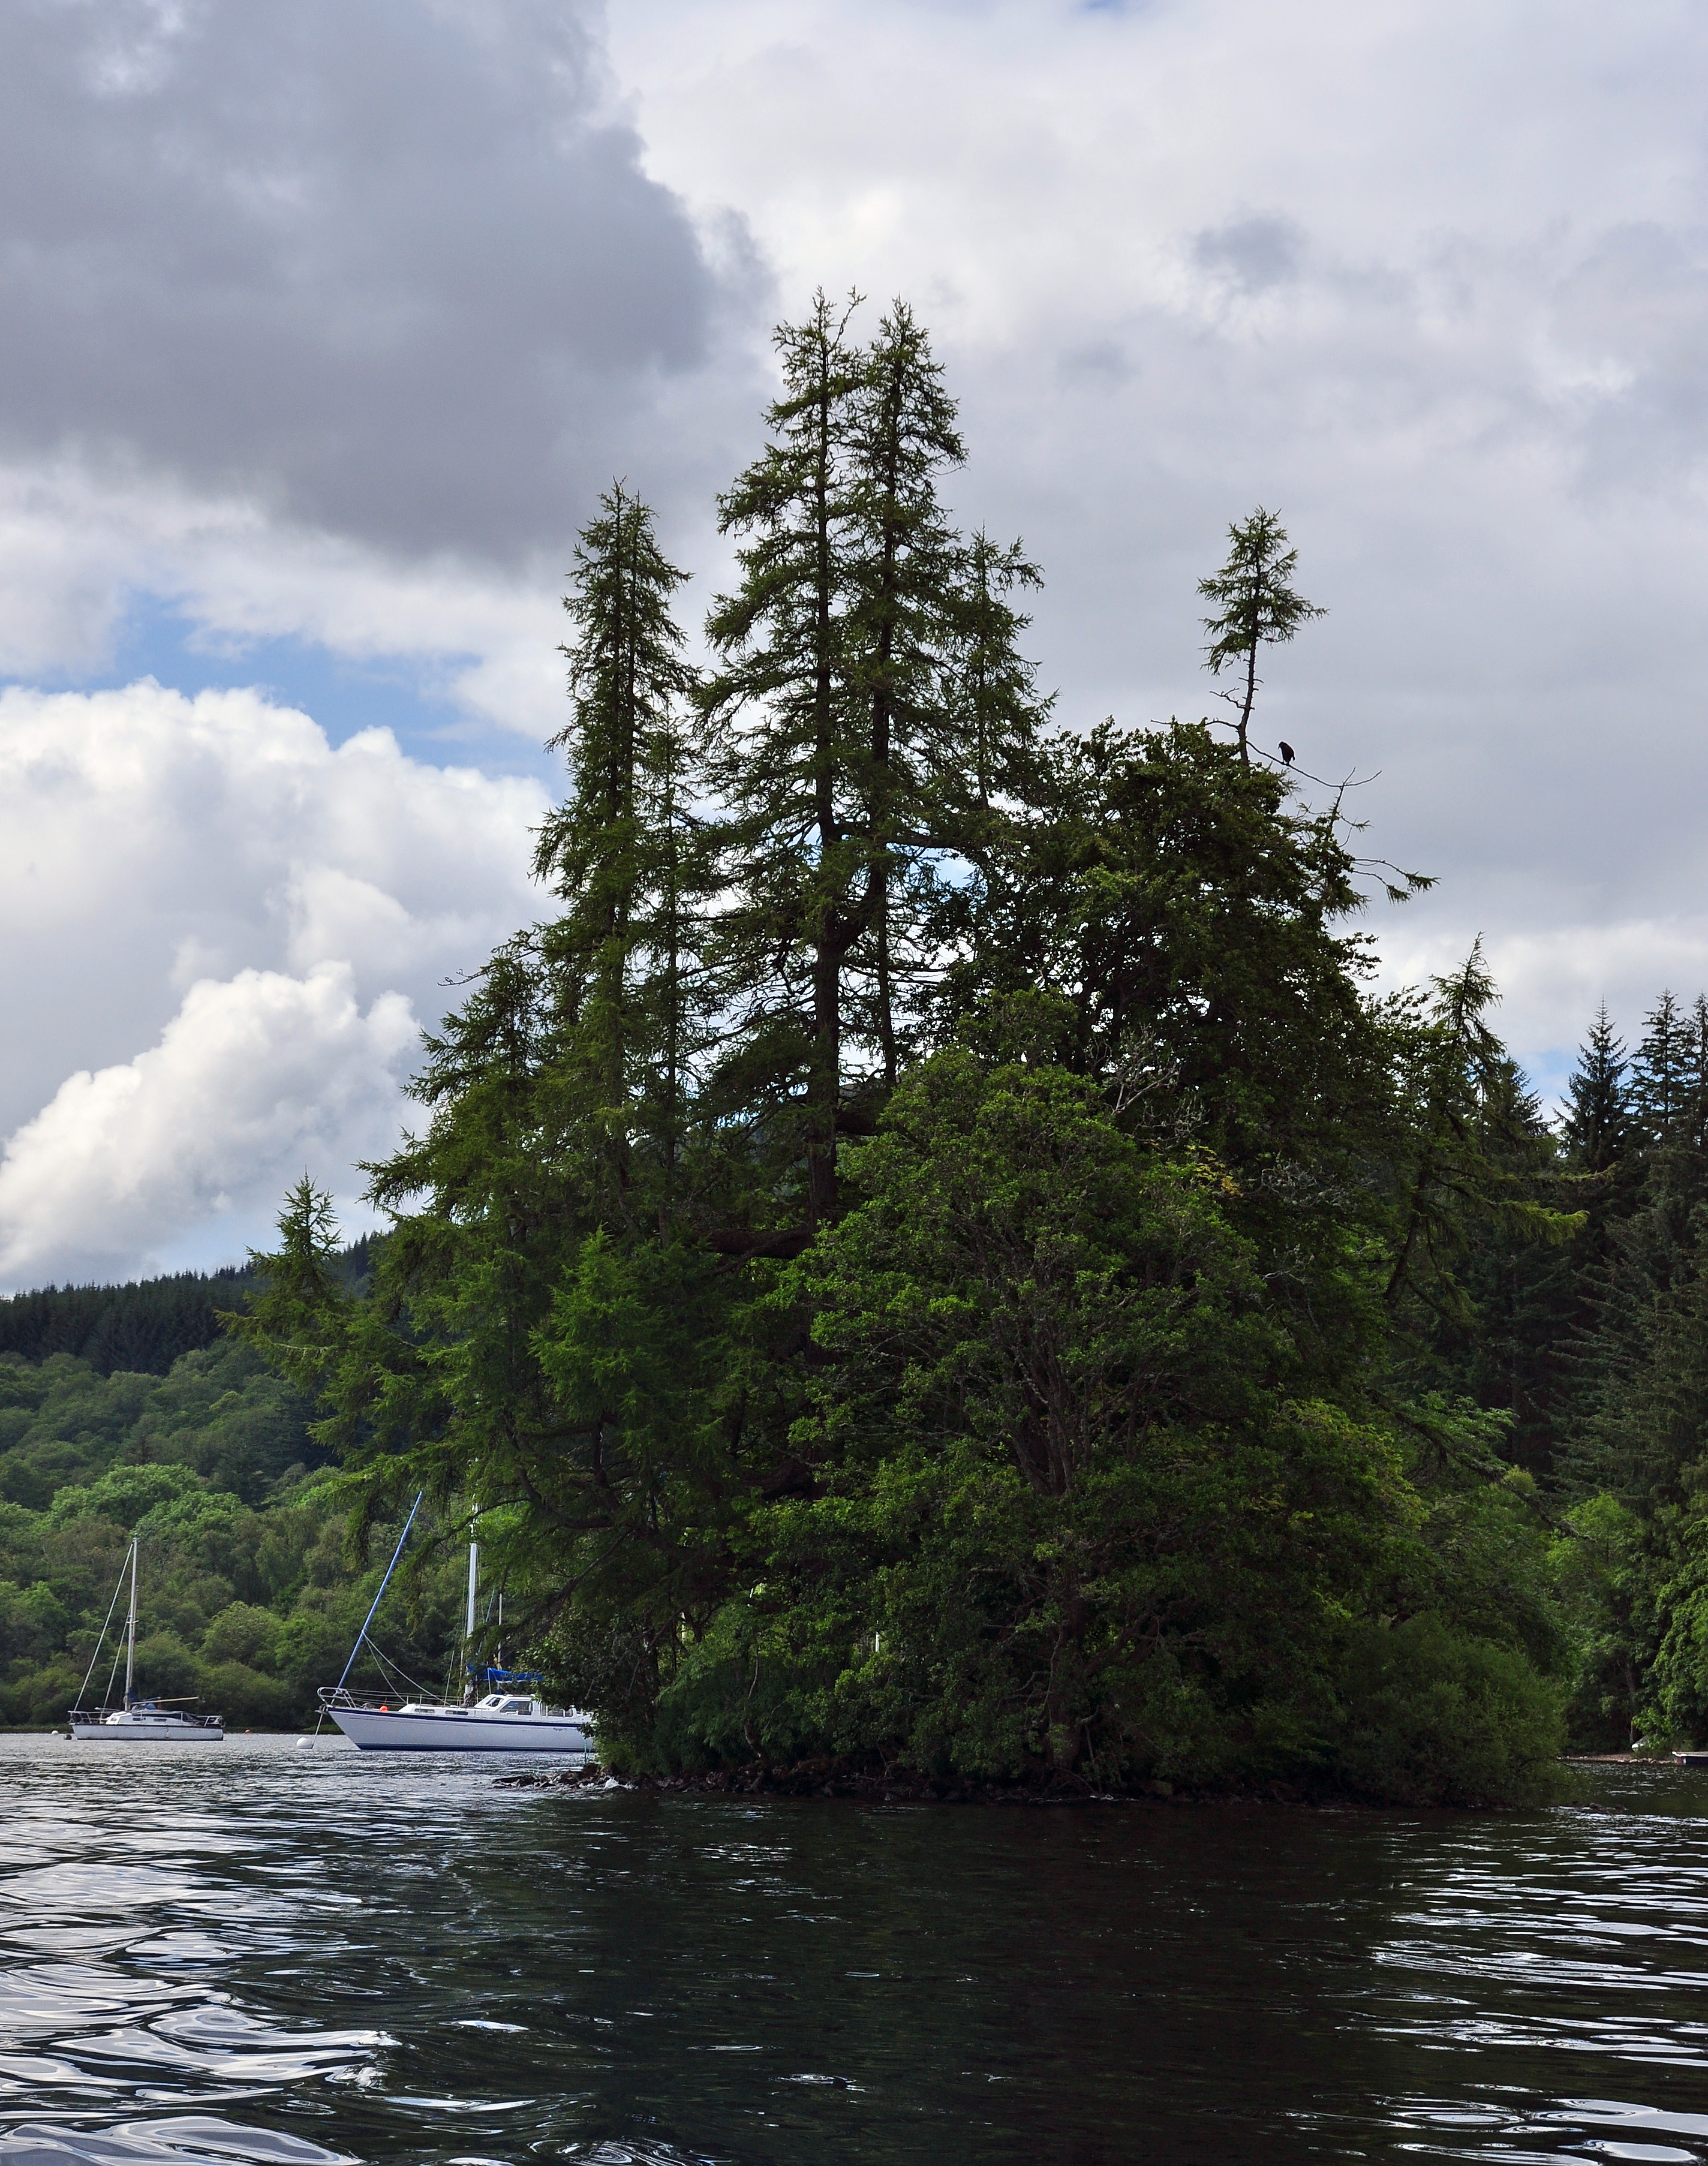 Island Loch Ness File:cherry Island Loch Ness